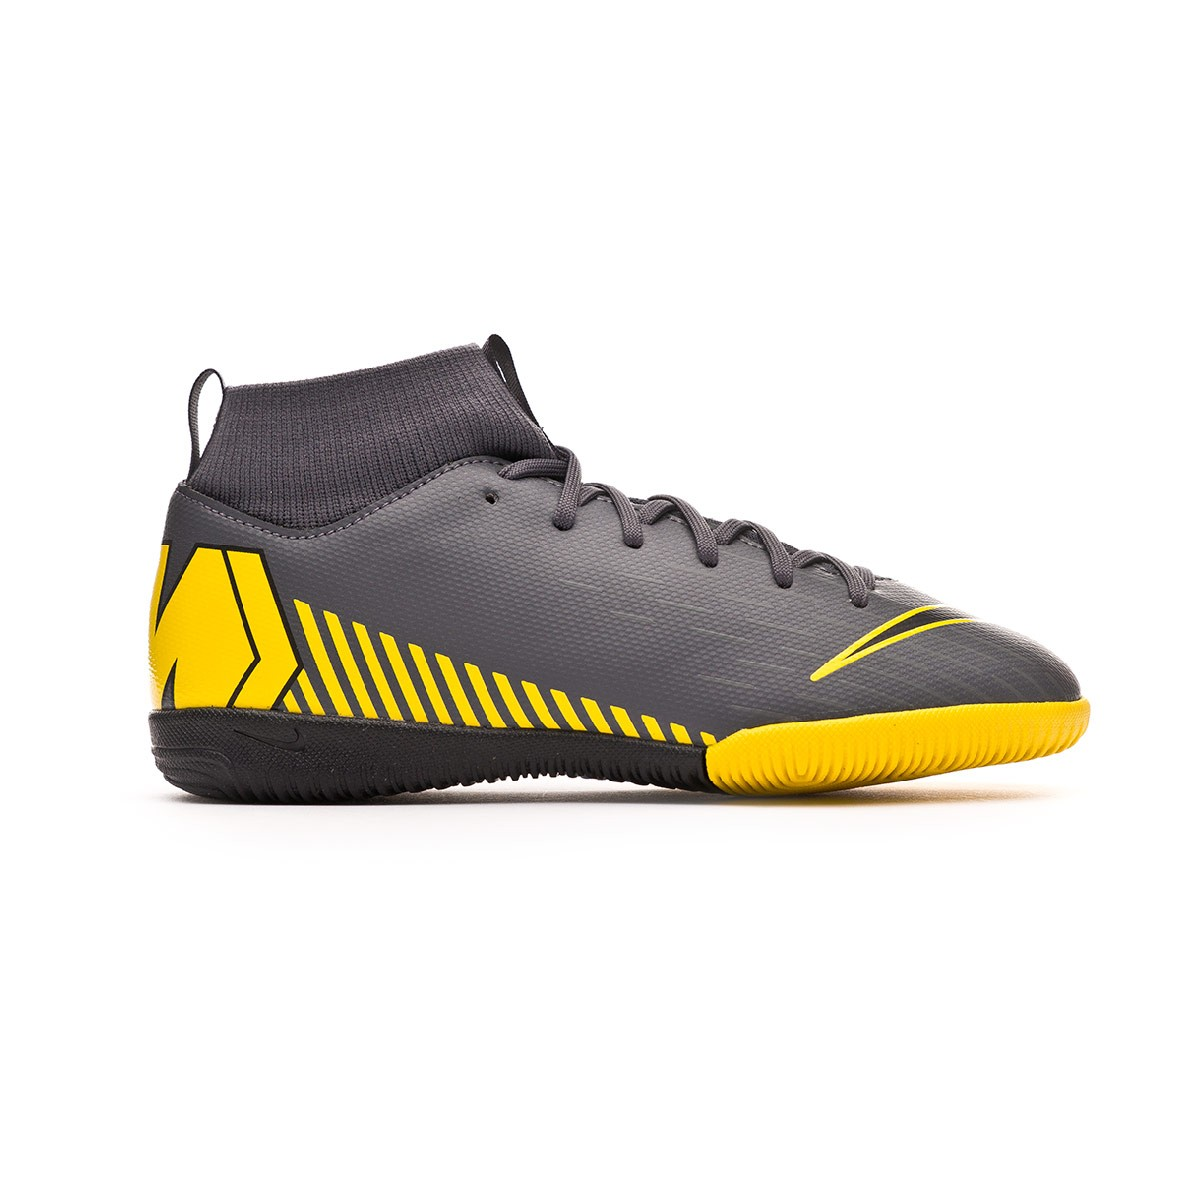 Nike Mercurial SuperflyX VI Academy IC Futsal Boot